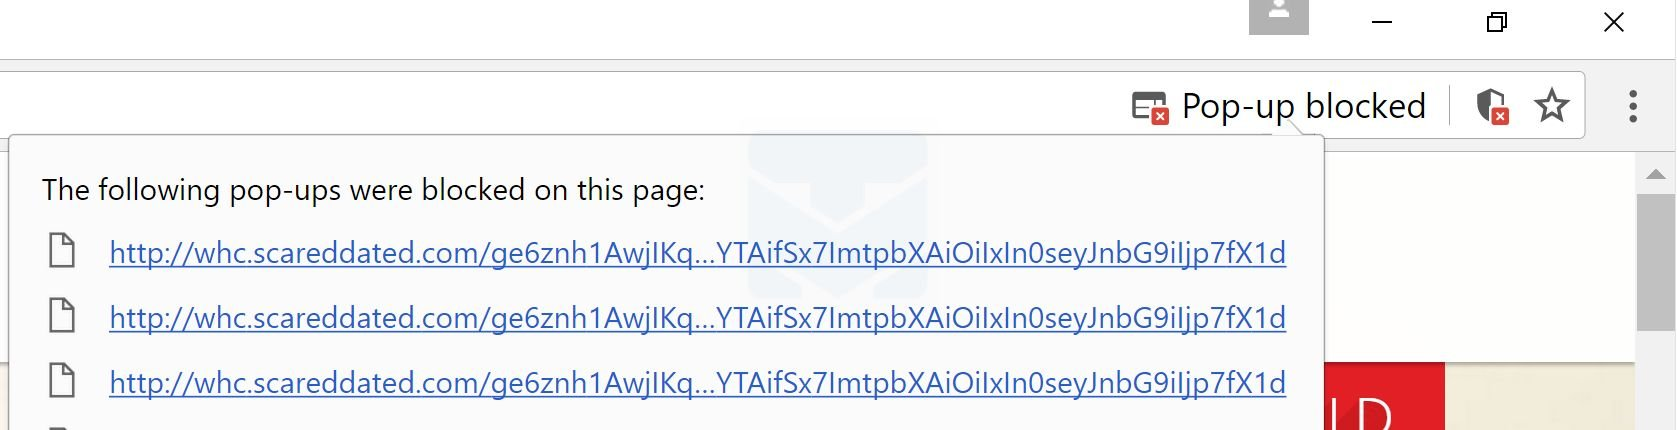 whc.scareddated.com redirect virus